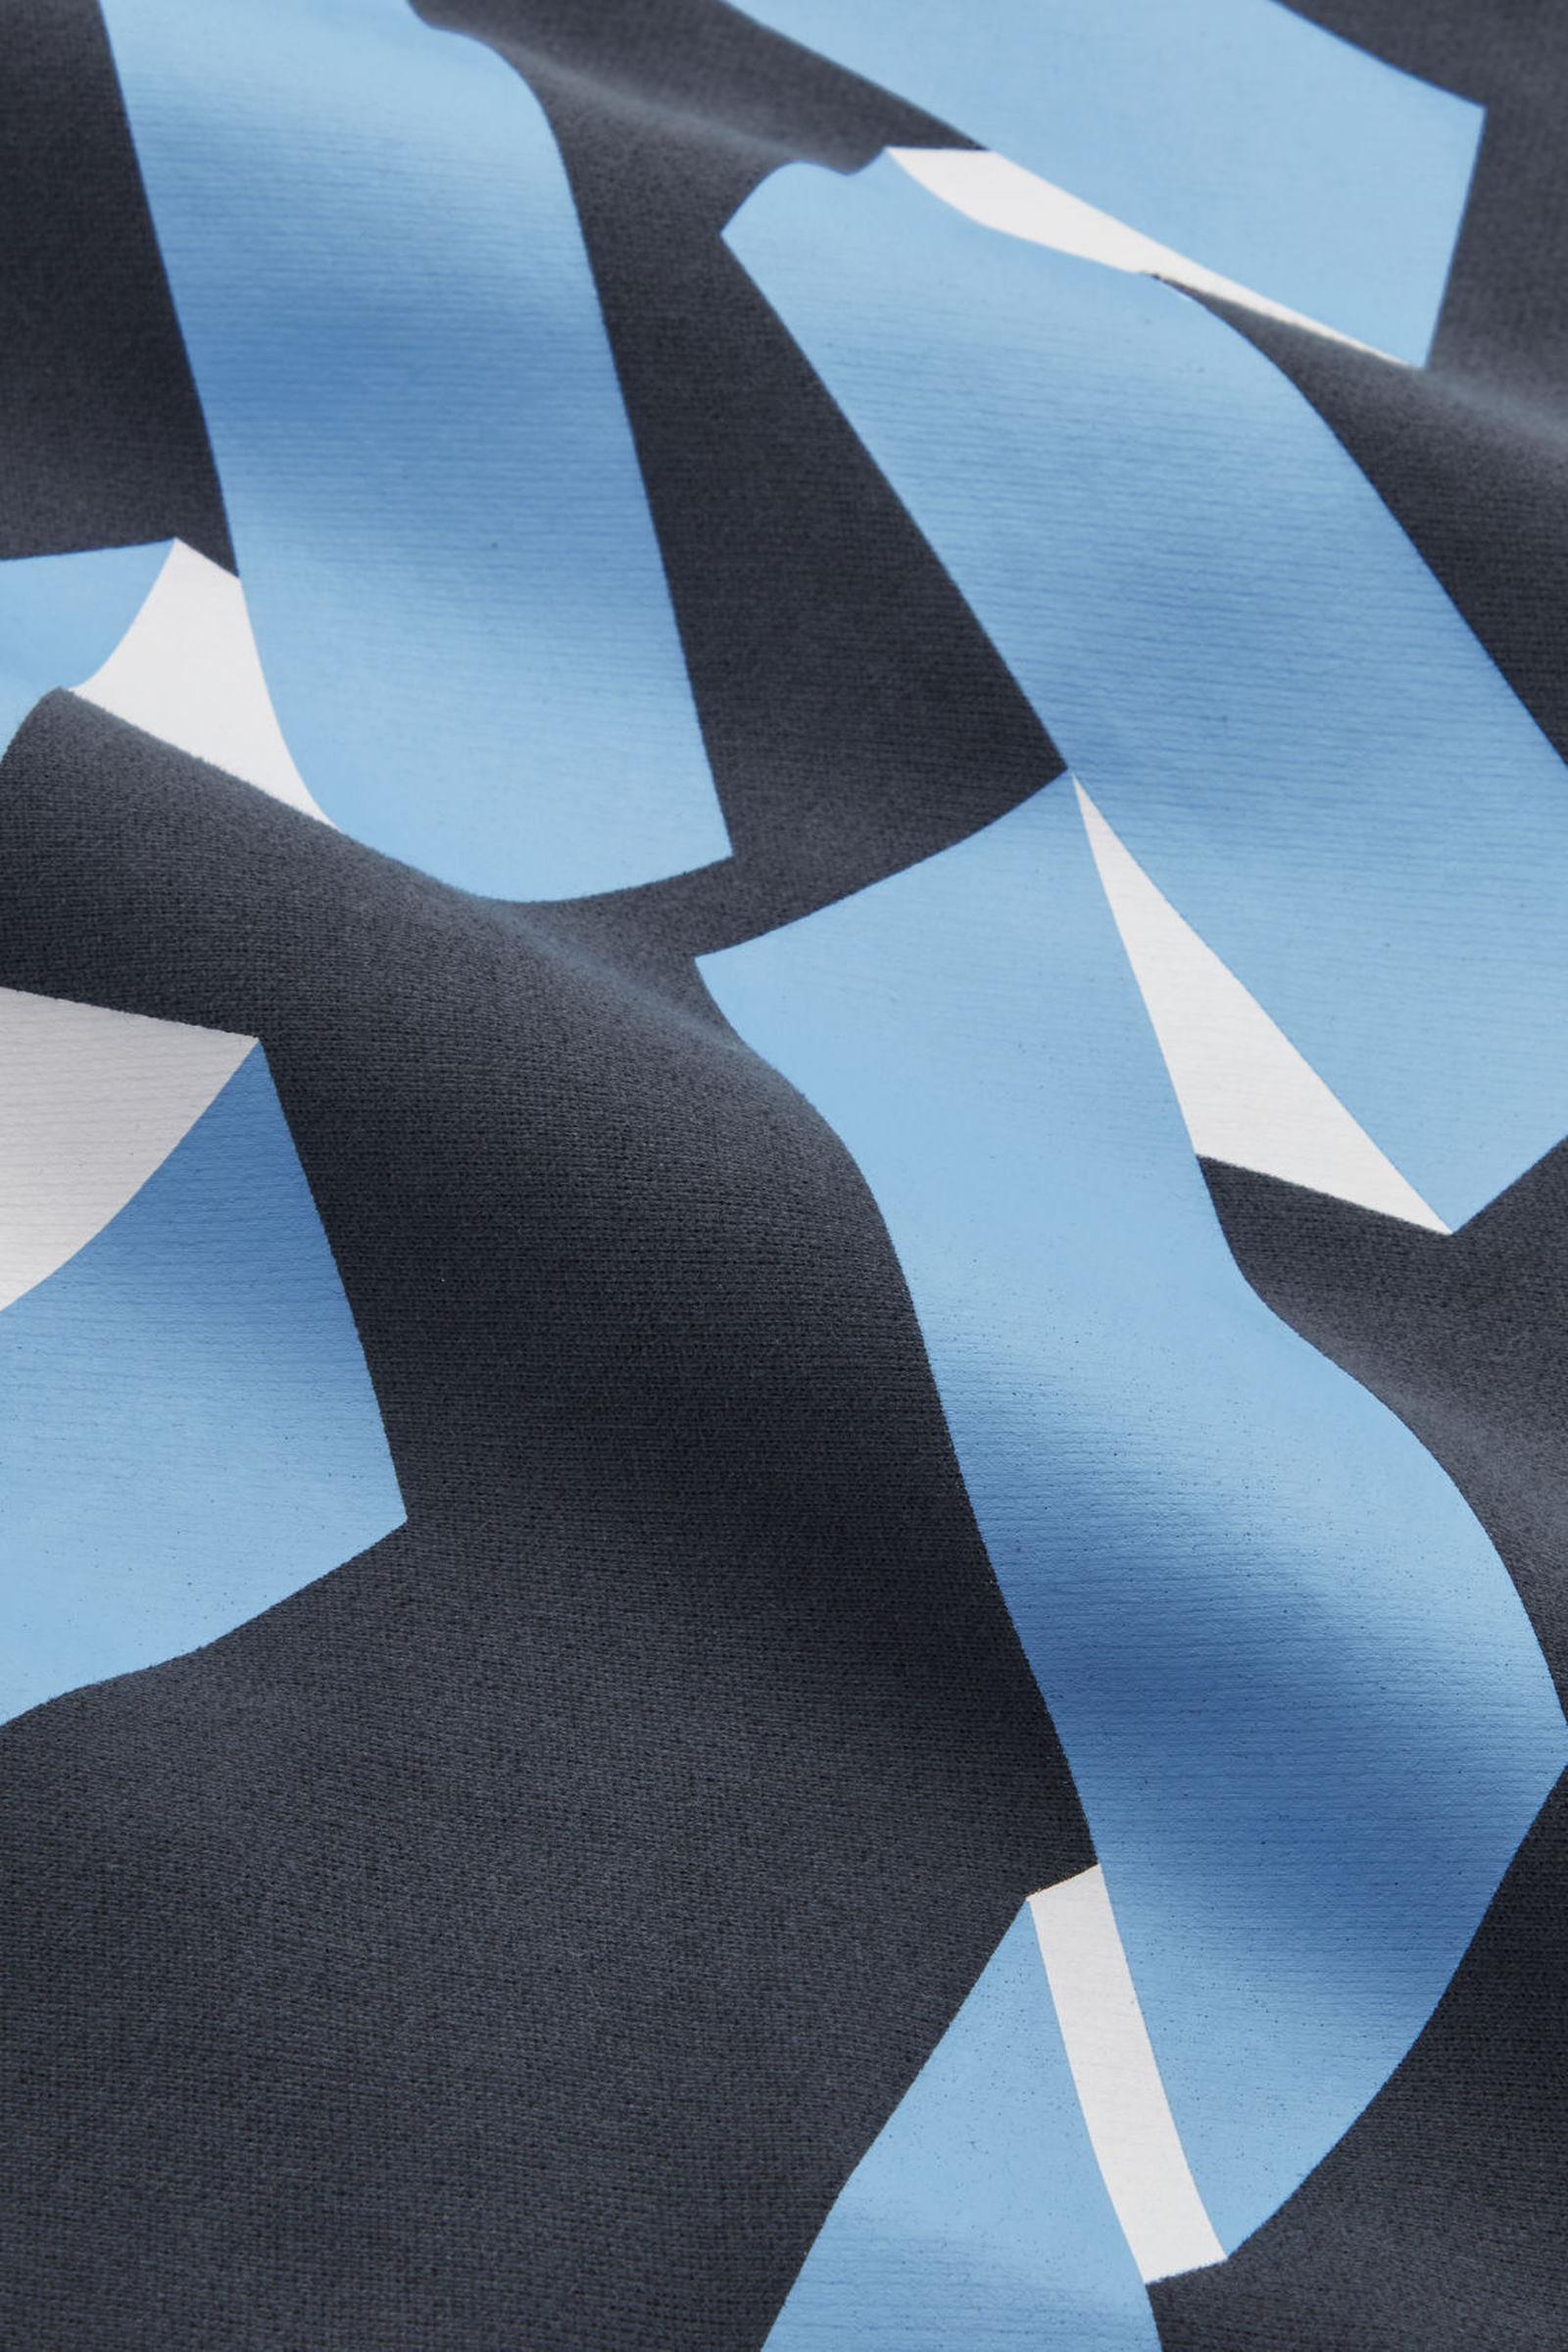 COS 그래픽 프린트 스웻셔츠의 그레이 / 블루 / 화이트컬러 Detail입니다.